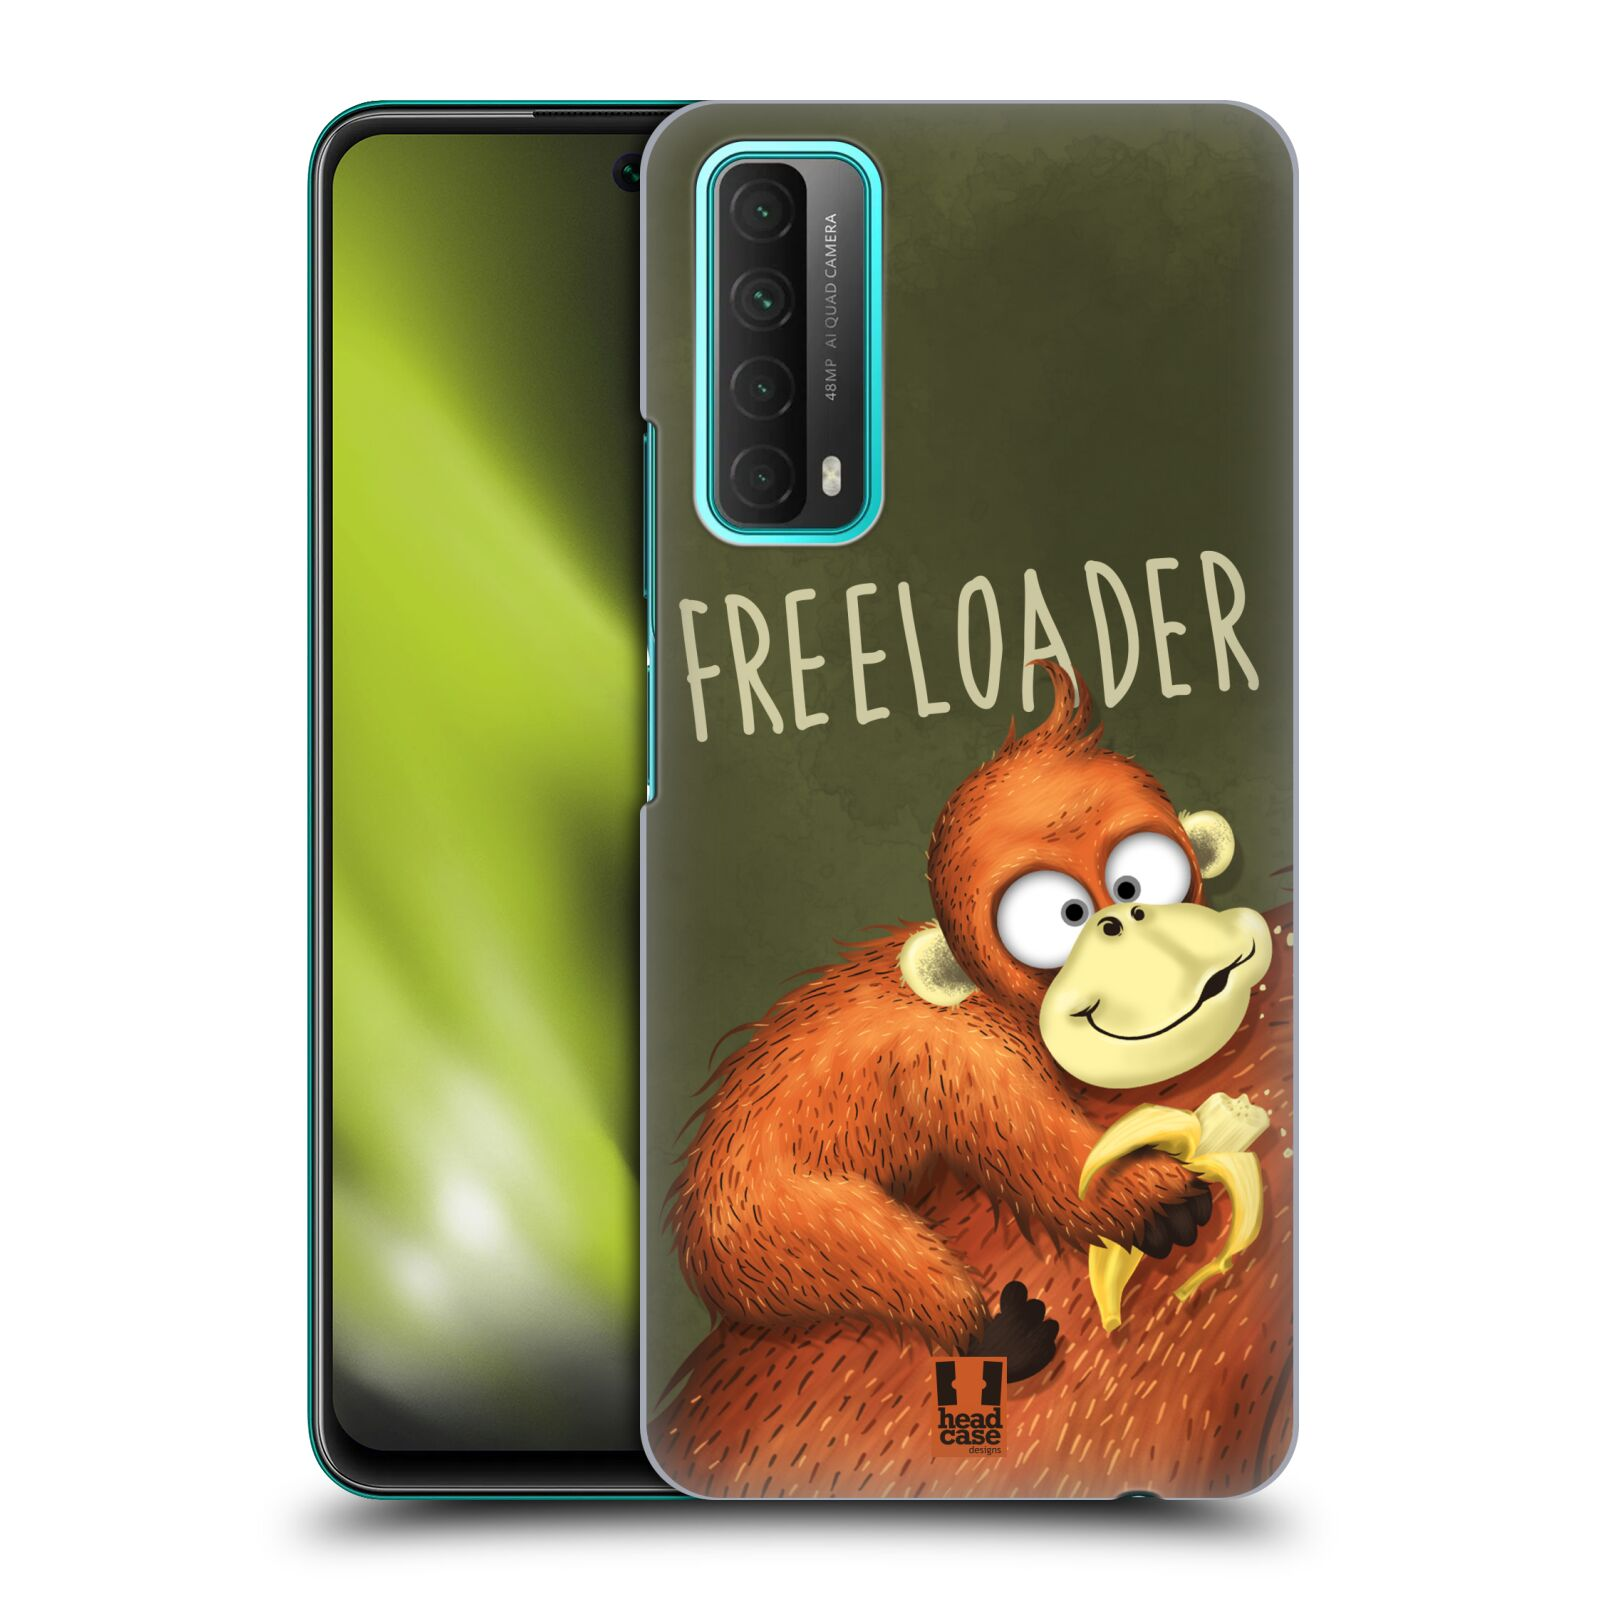 Plastové pouzdro na mobil Huawei P Smart (2021) - Head Case - Opičák Freeloader